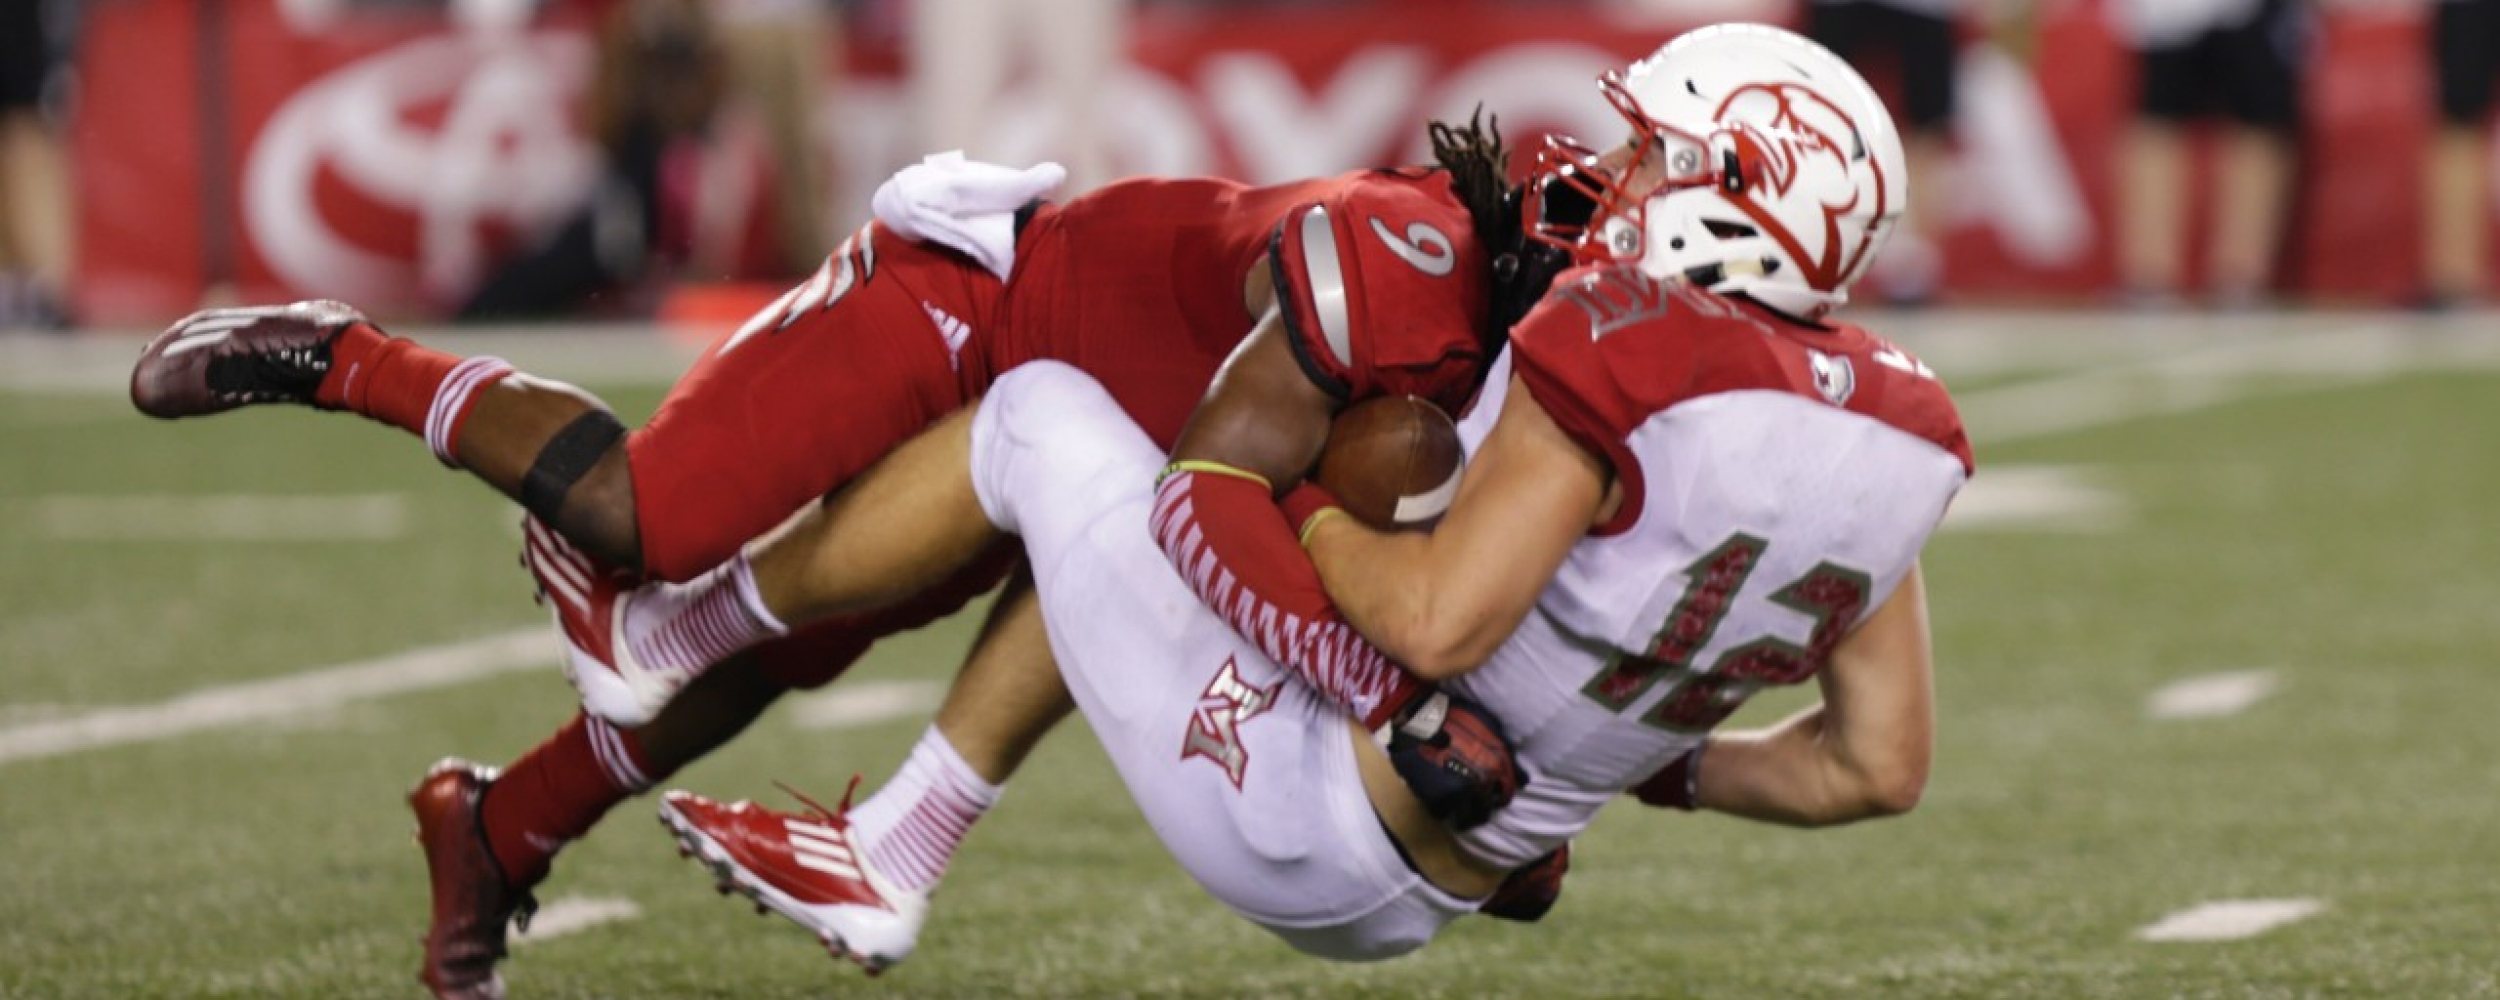 Football player tackling quarterback.